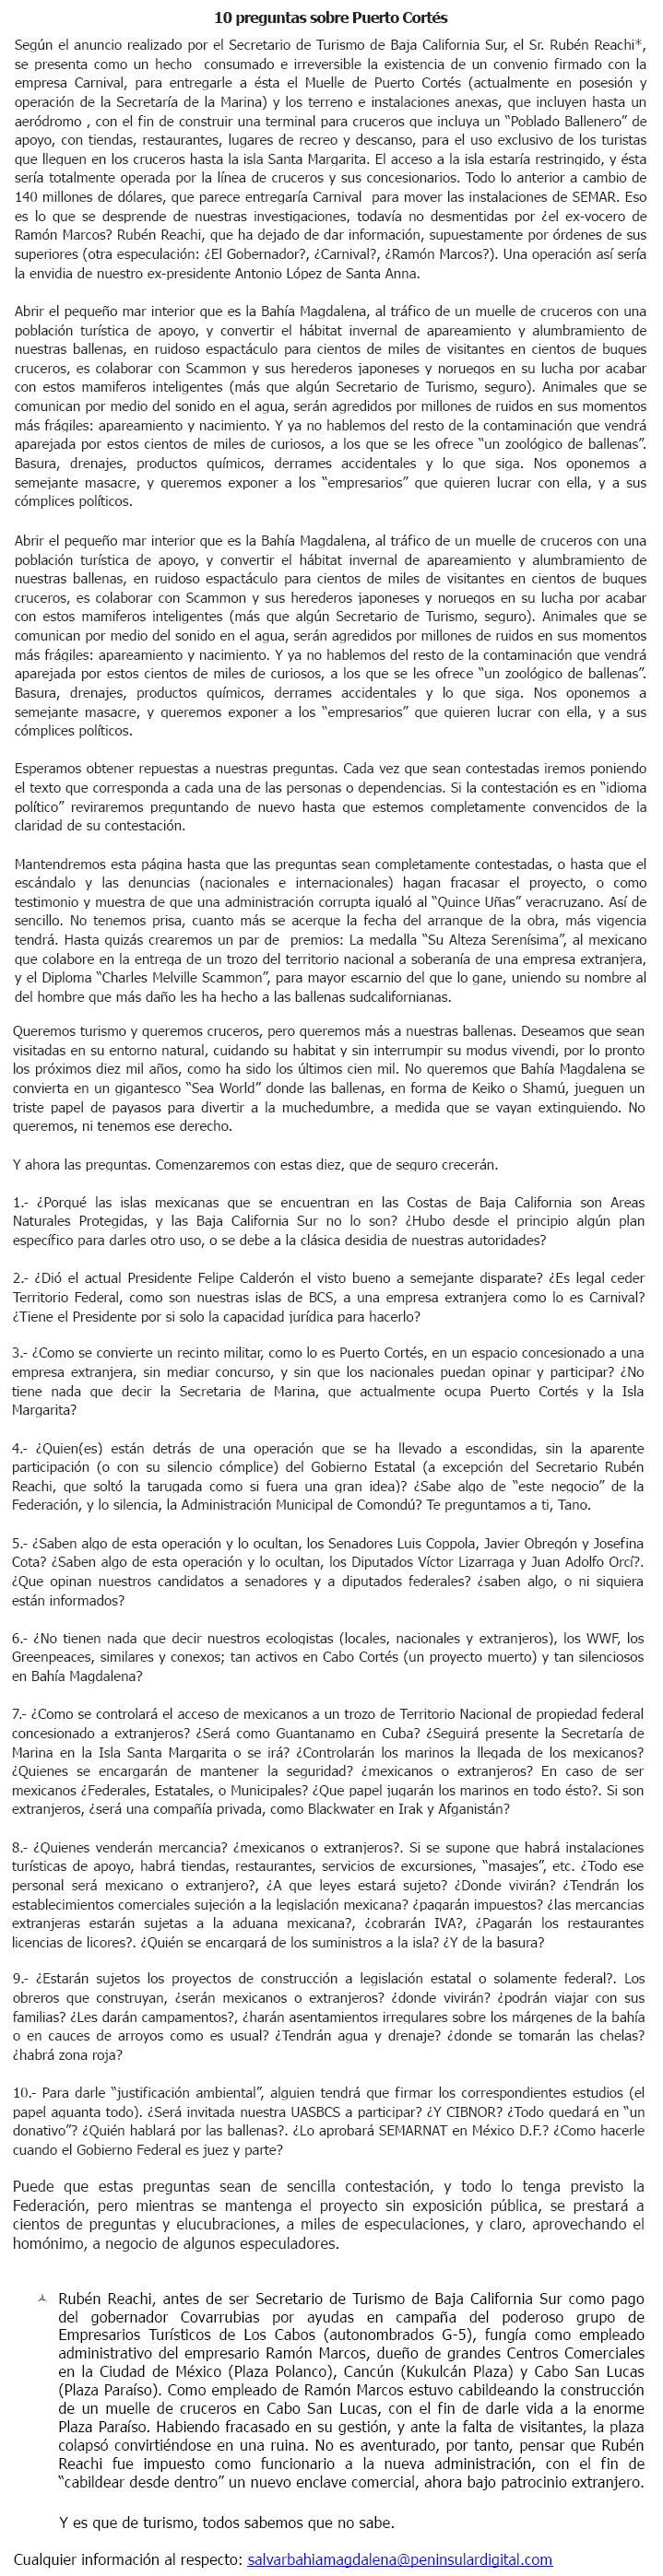 10 Preguntas sobre Puerto Cortés